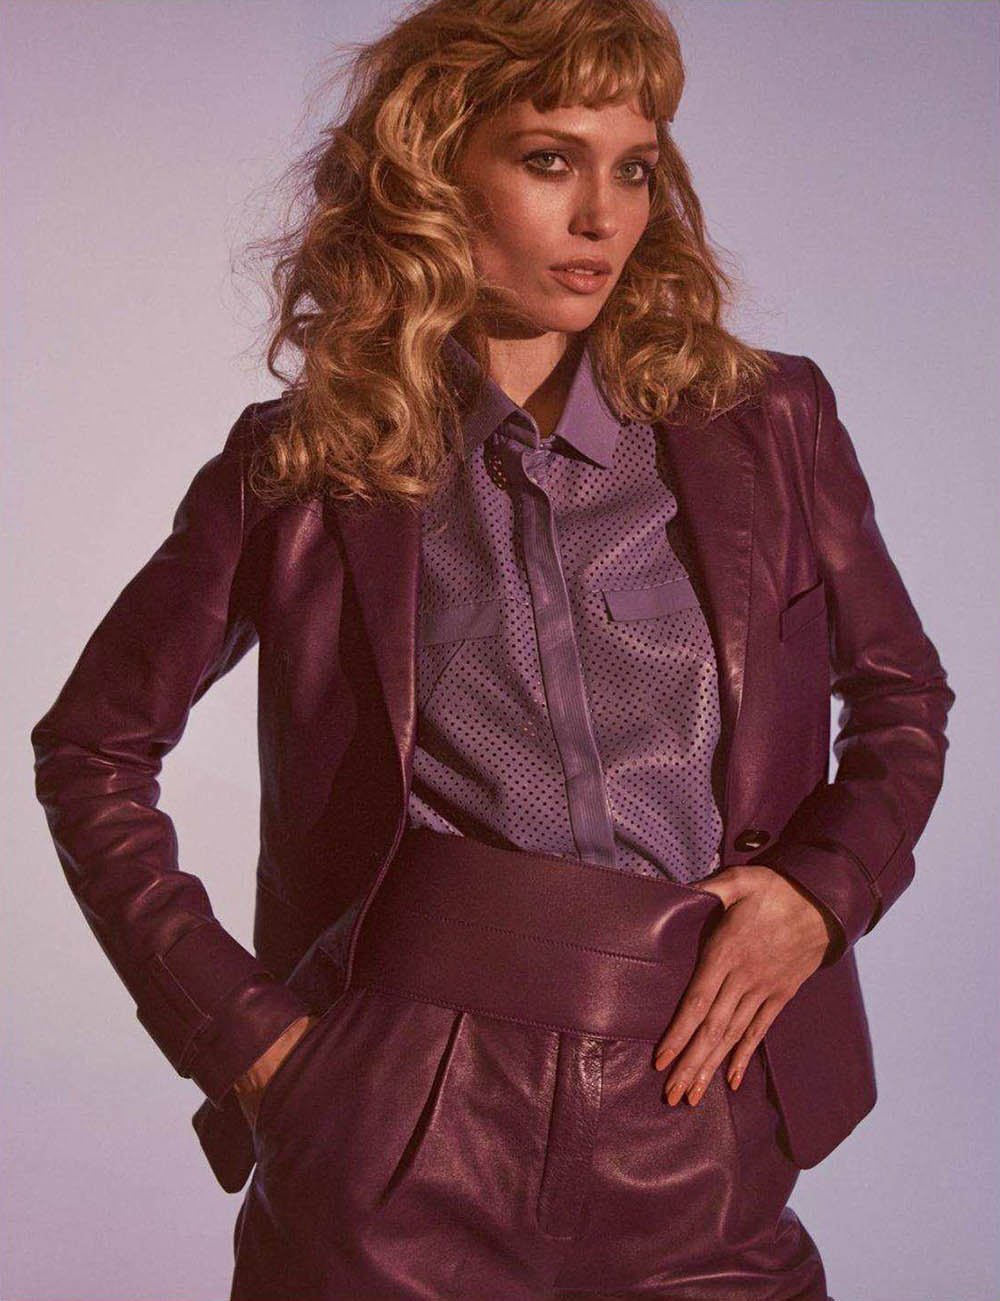 Hana Jirickova by Gregory Harris for Vogue Paris April 2018